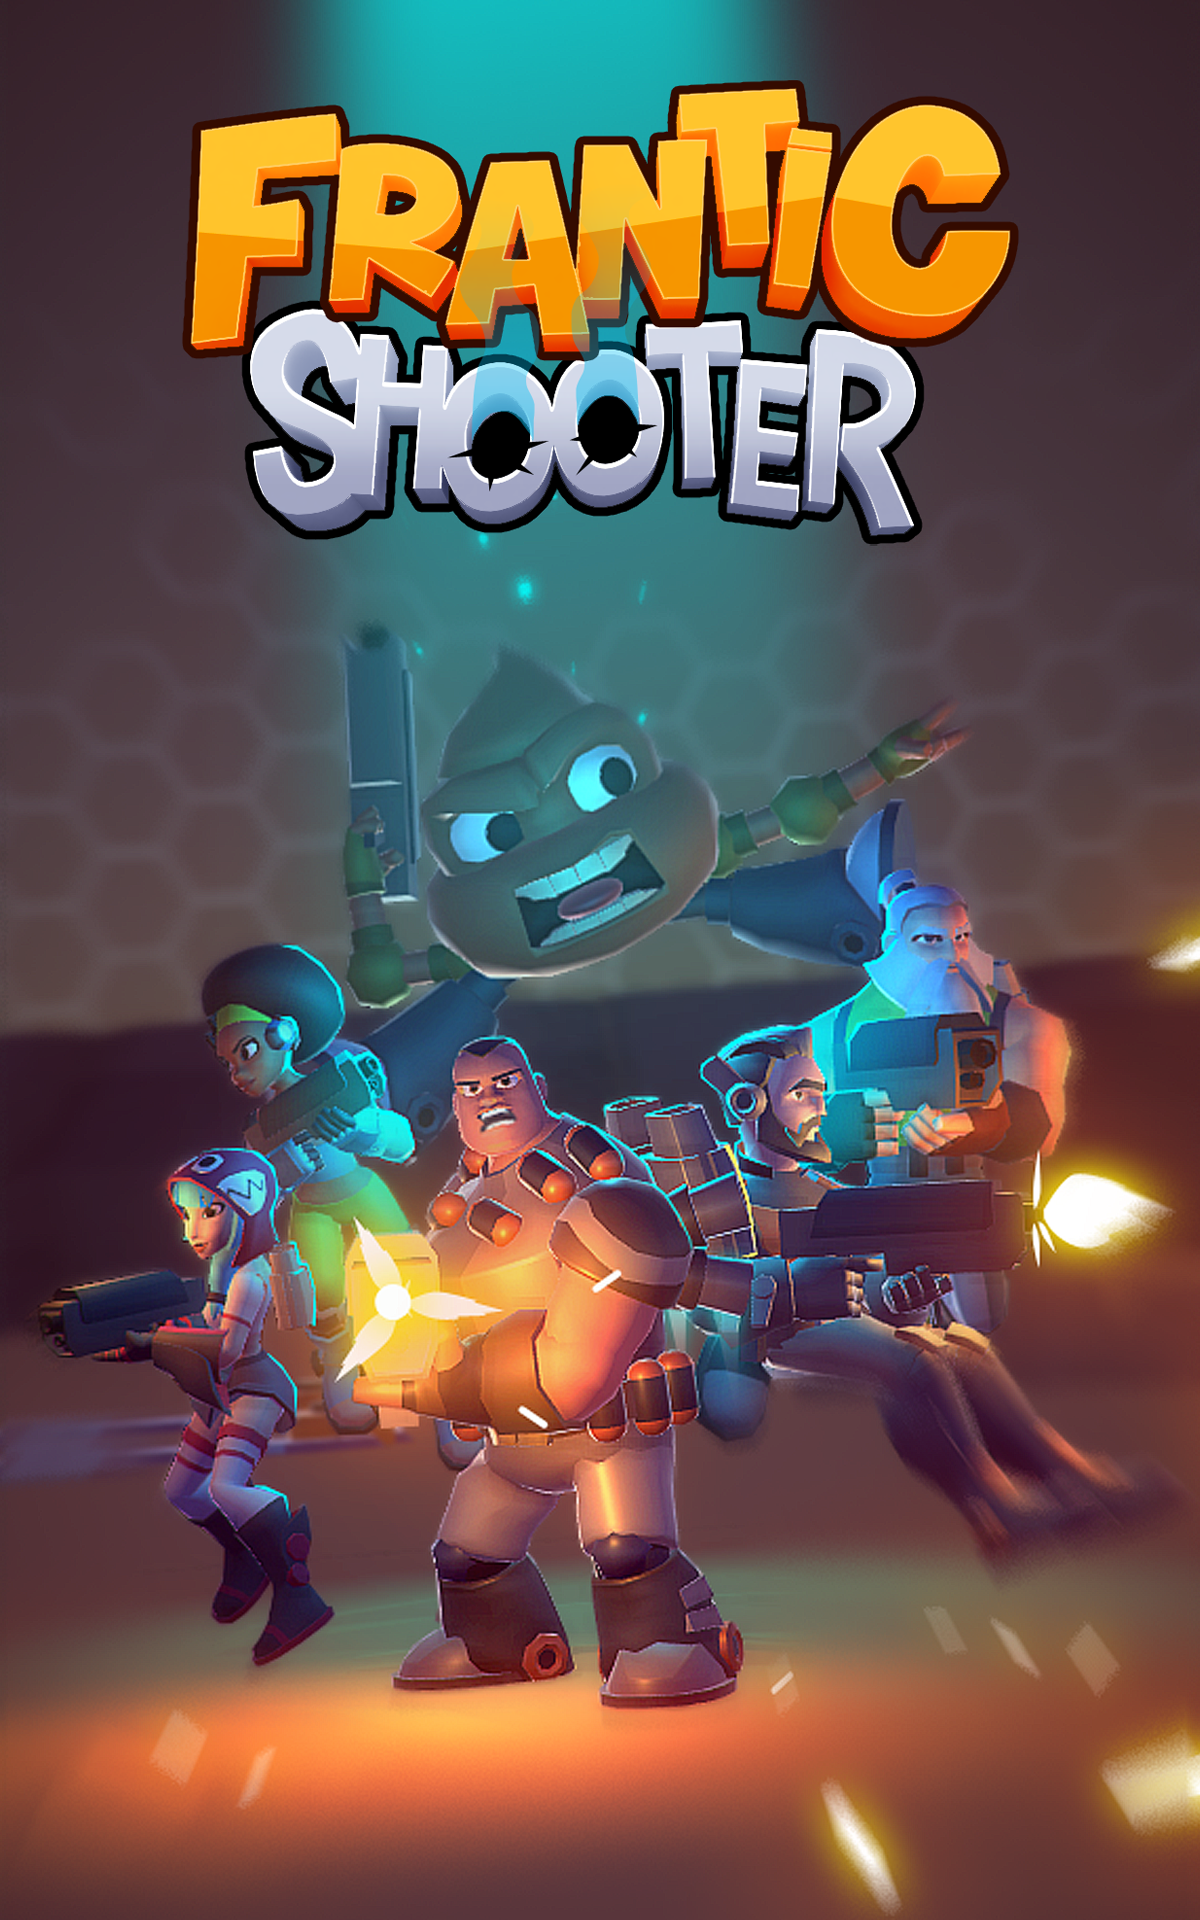 Frantic Shooter screenshot #6